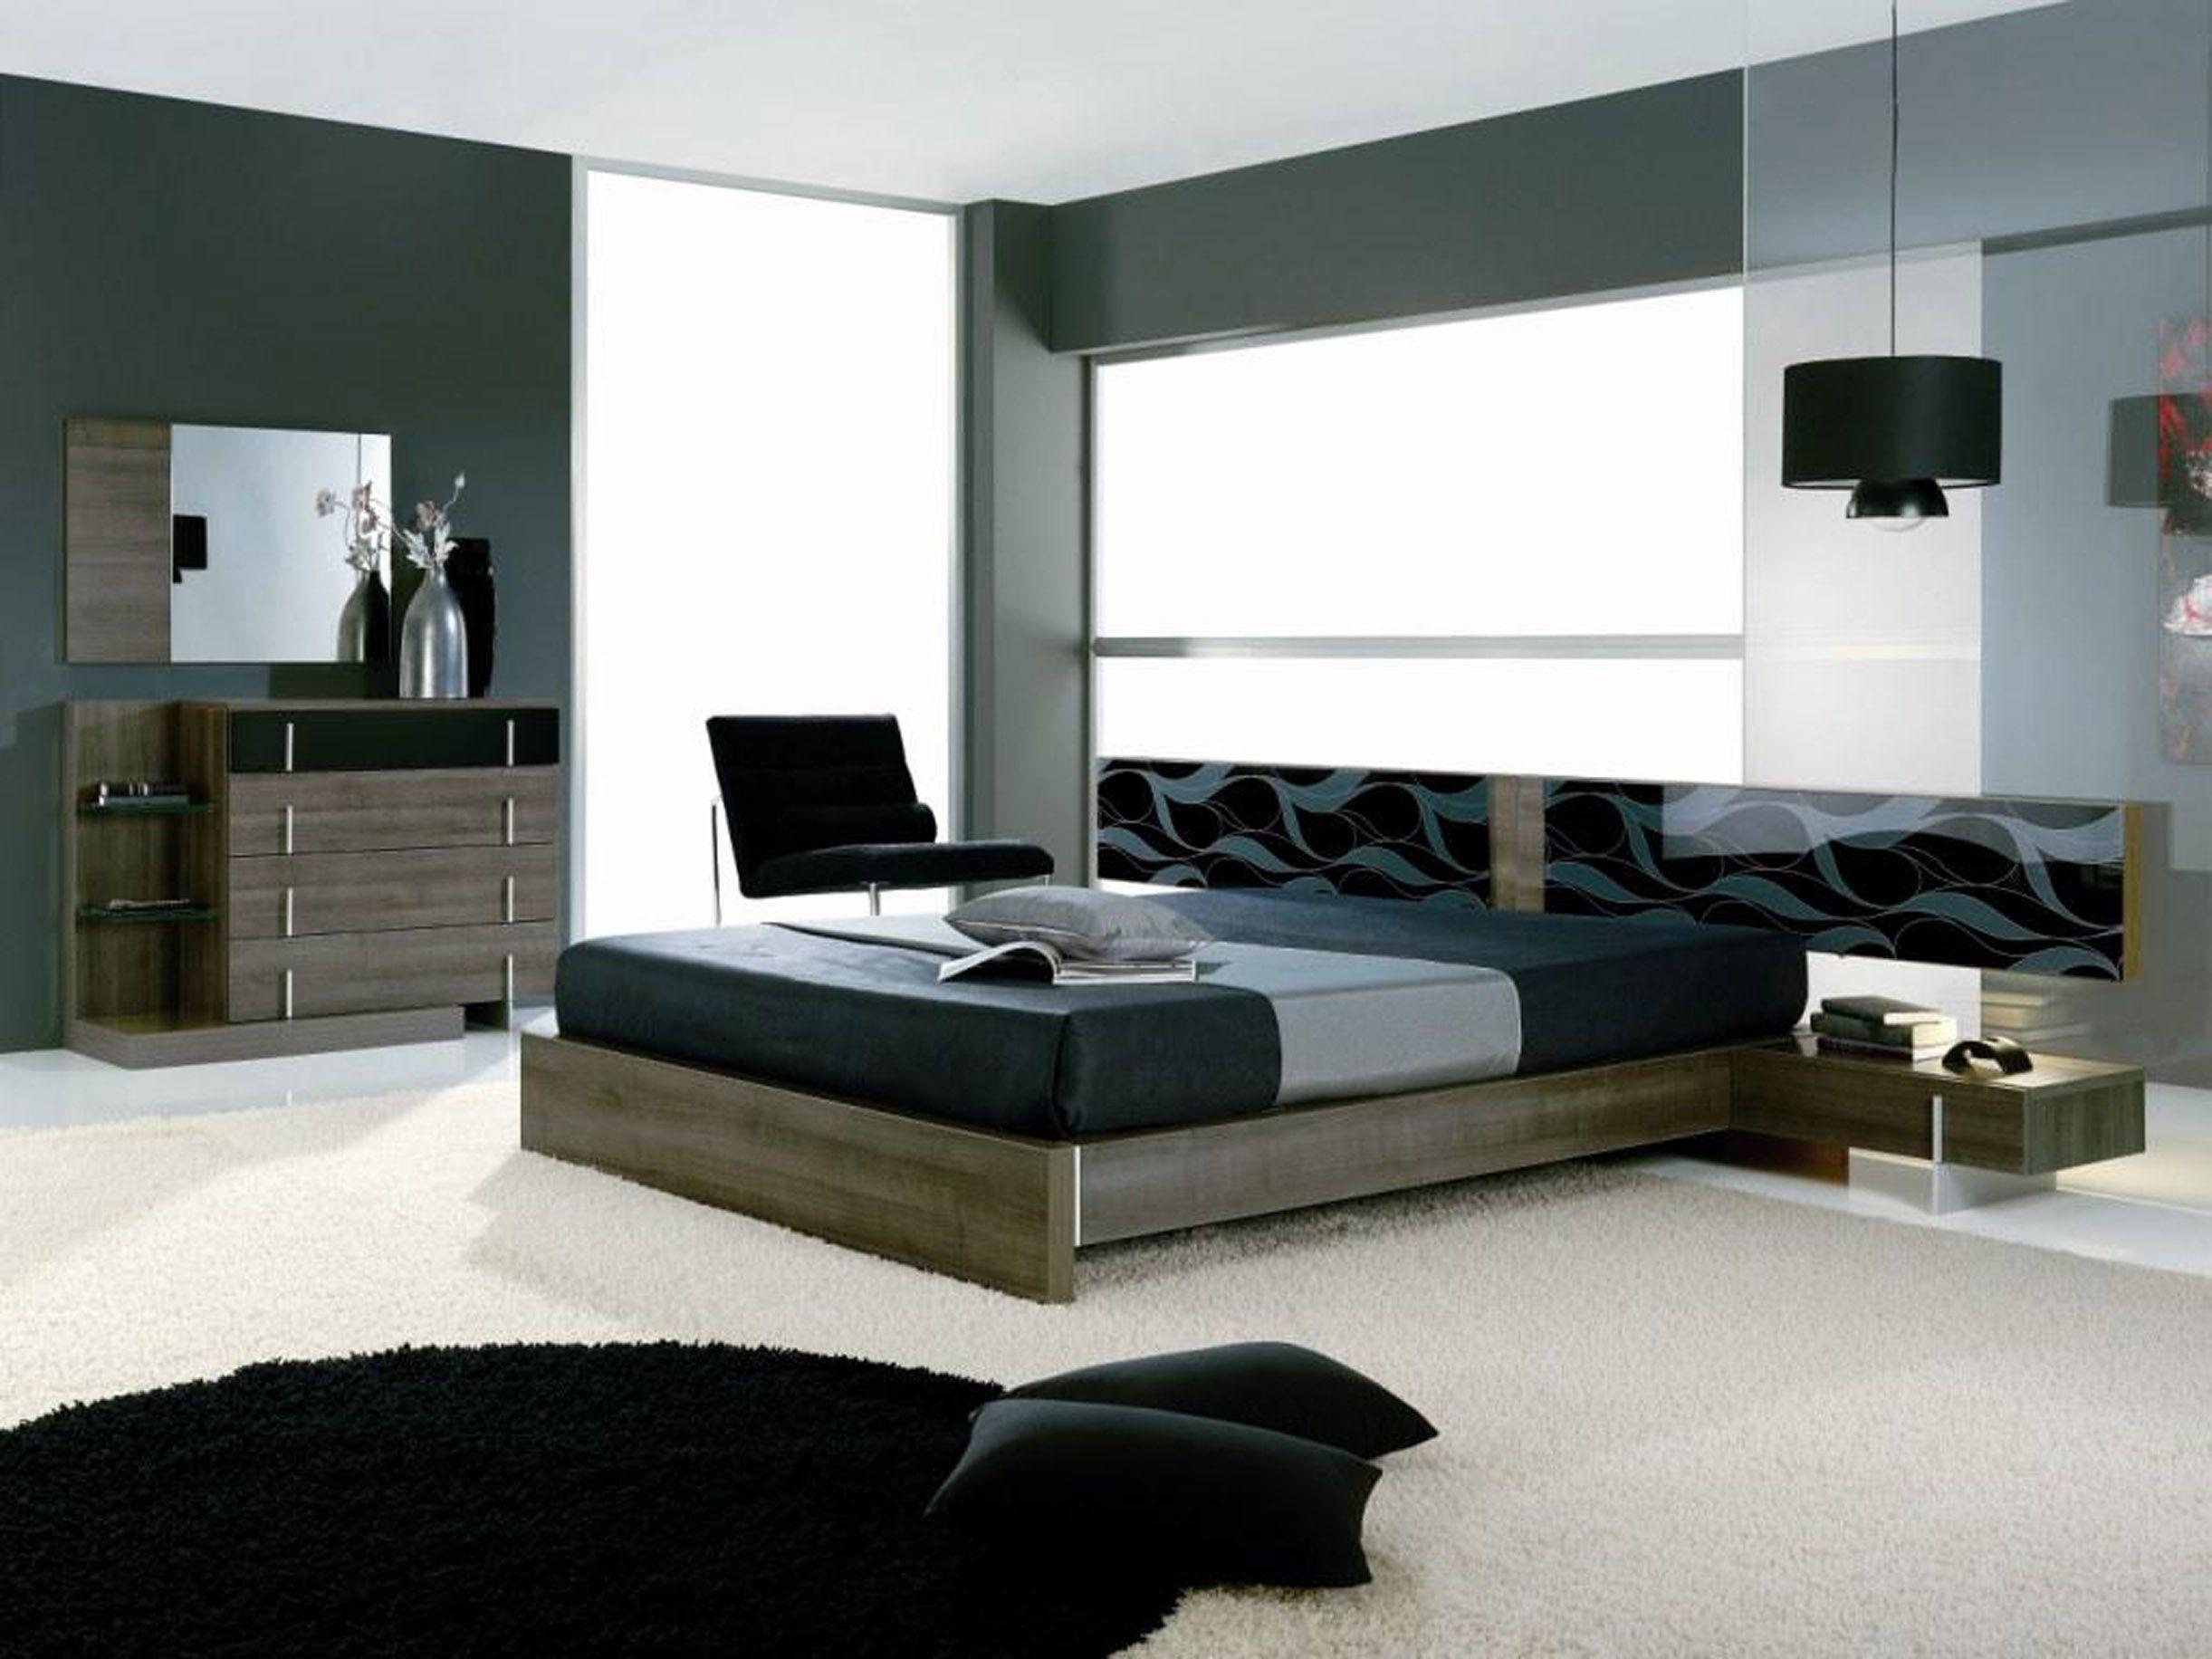 Moderne Stil Schlafzimmer Holz Bett Designs, Bilder, Holz